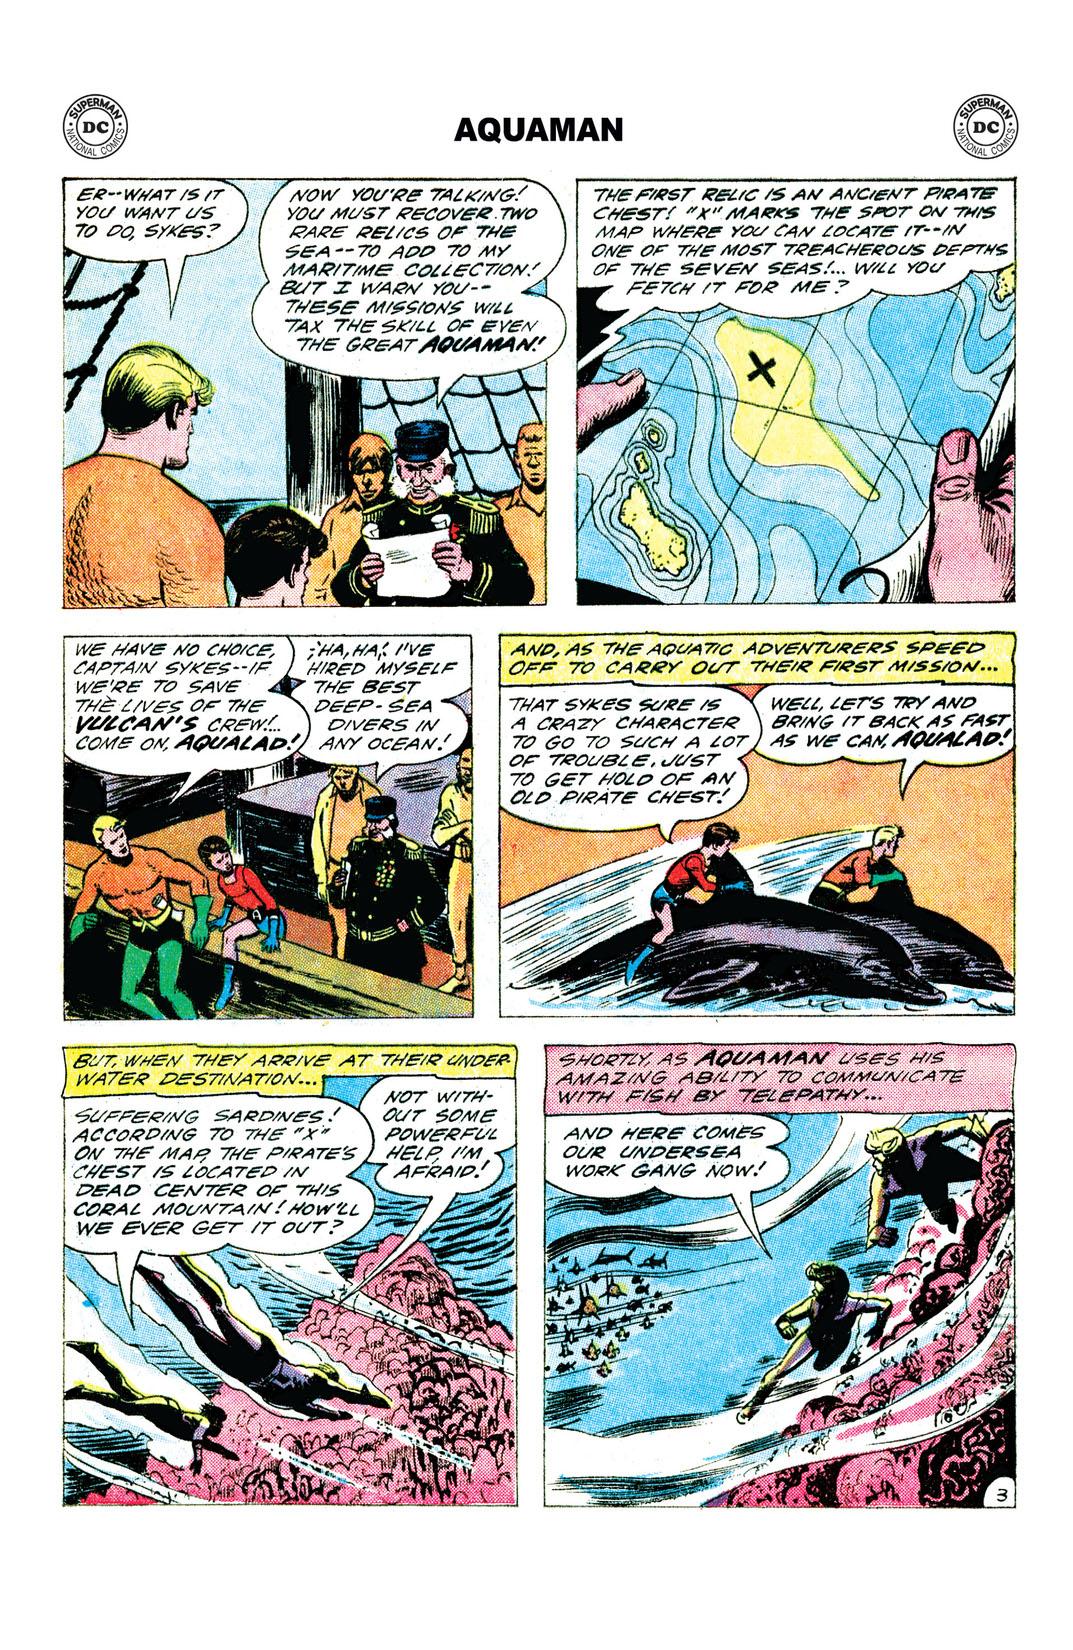 Read Aquaman 1962 2 On Dc Universe - Dc-universe-us-map